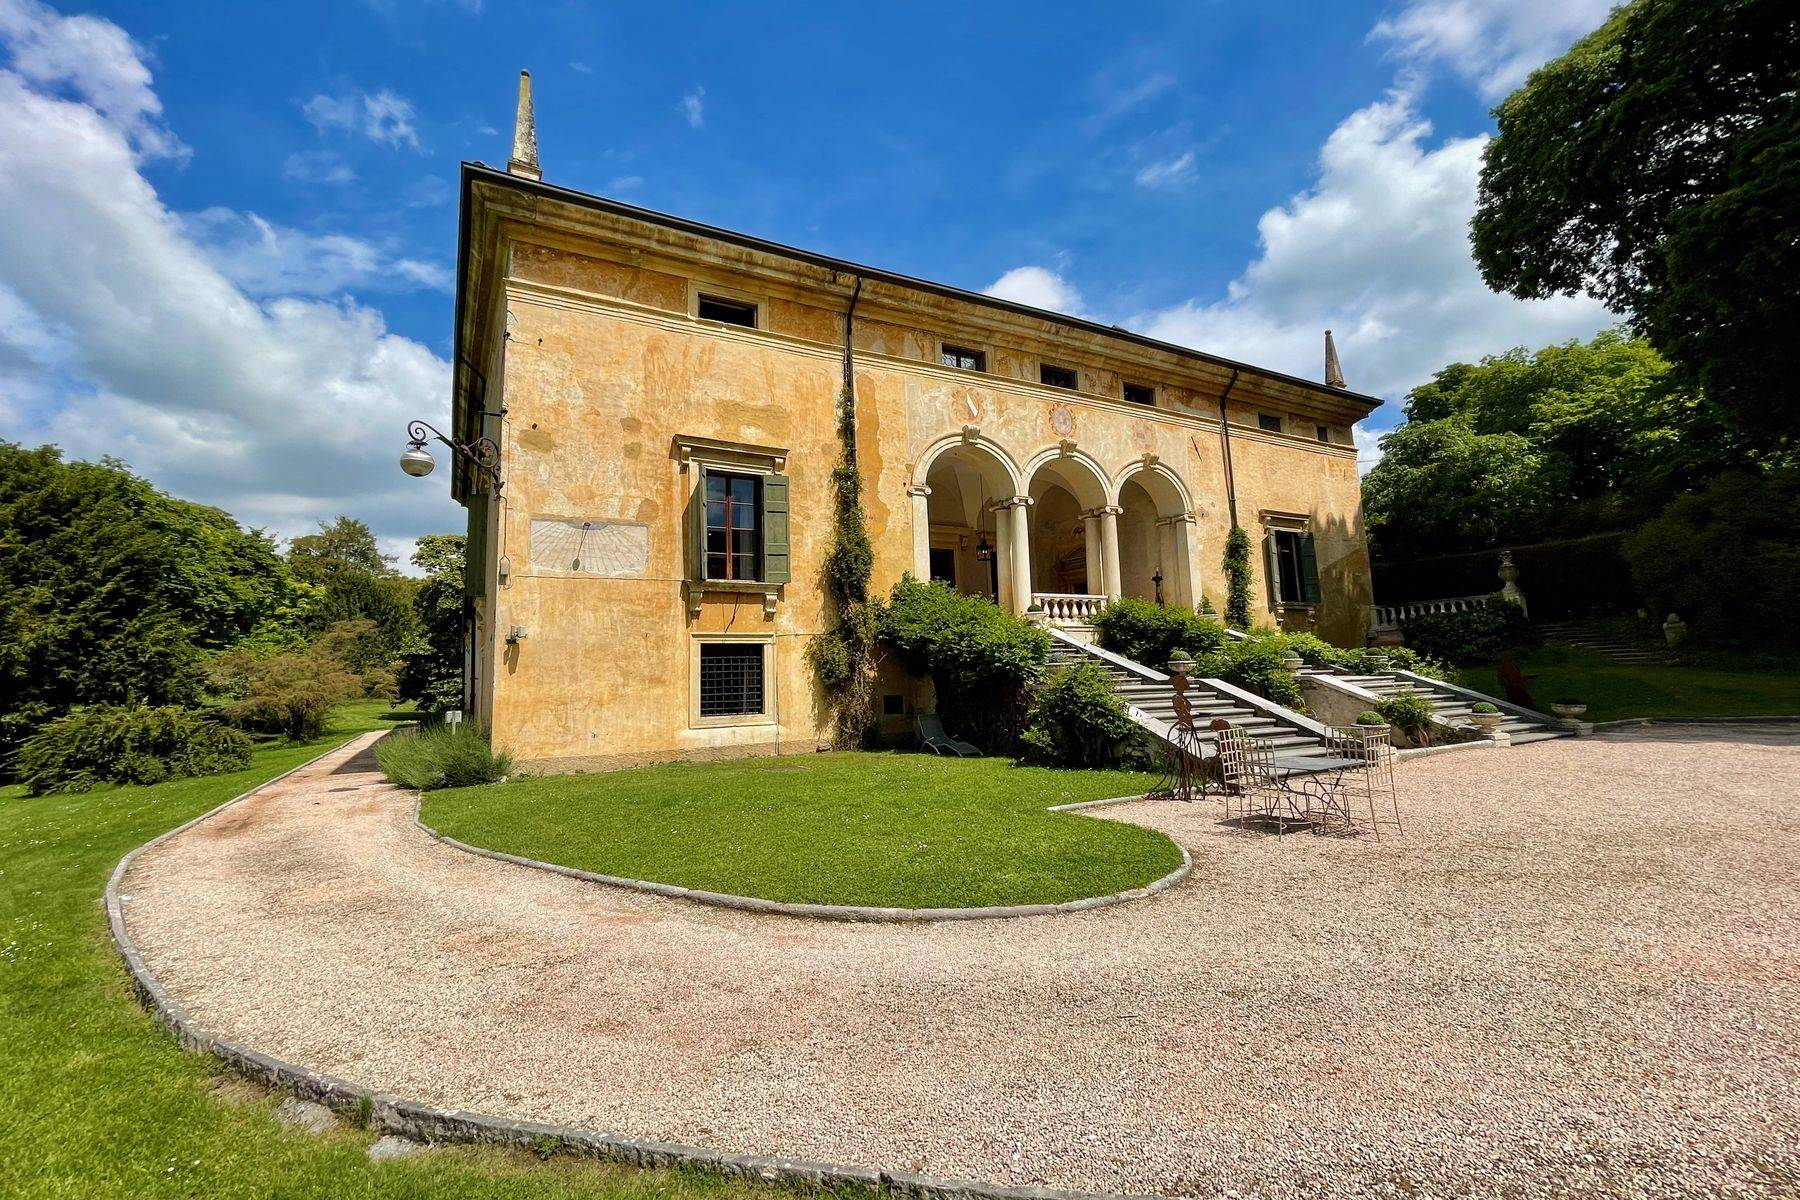 Villa in Vendita a Verona: 5 locali, 2400 mq - Foto 1